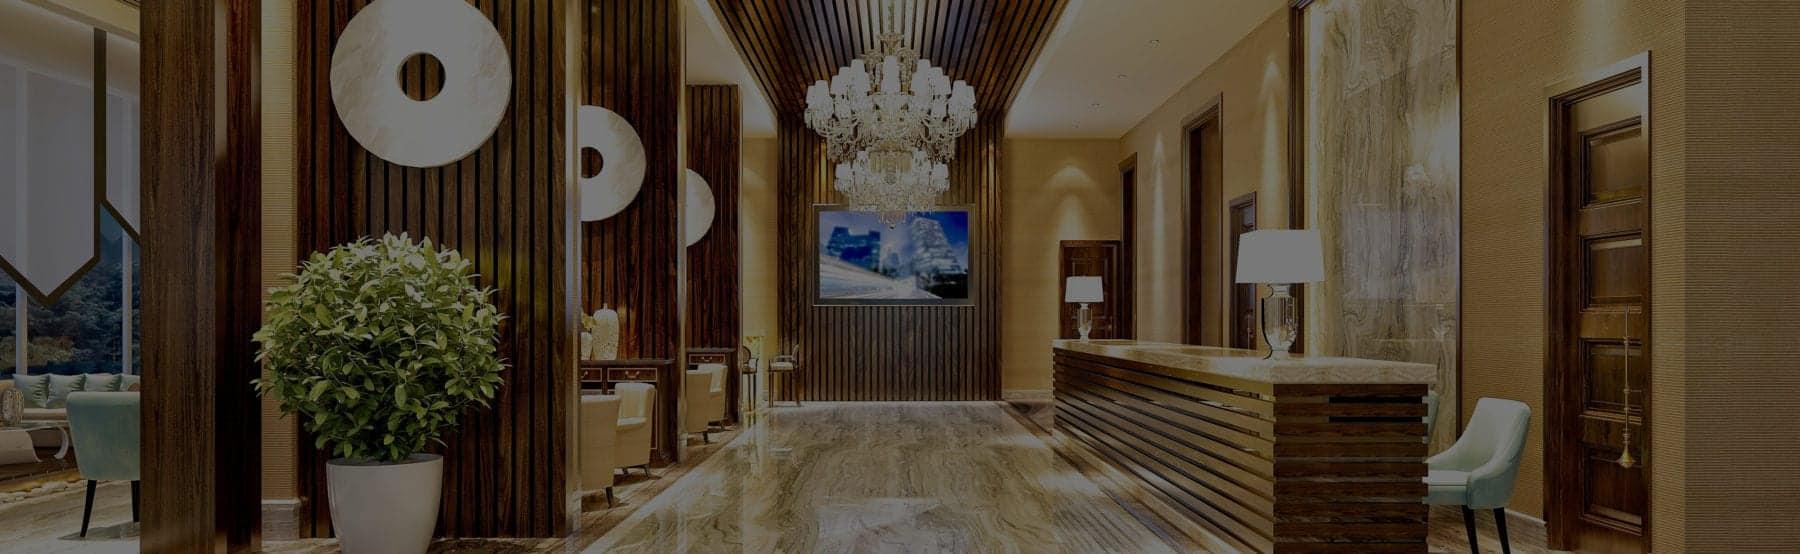 Hospitality-Interior-Design-art-services